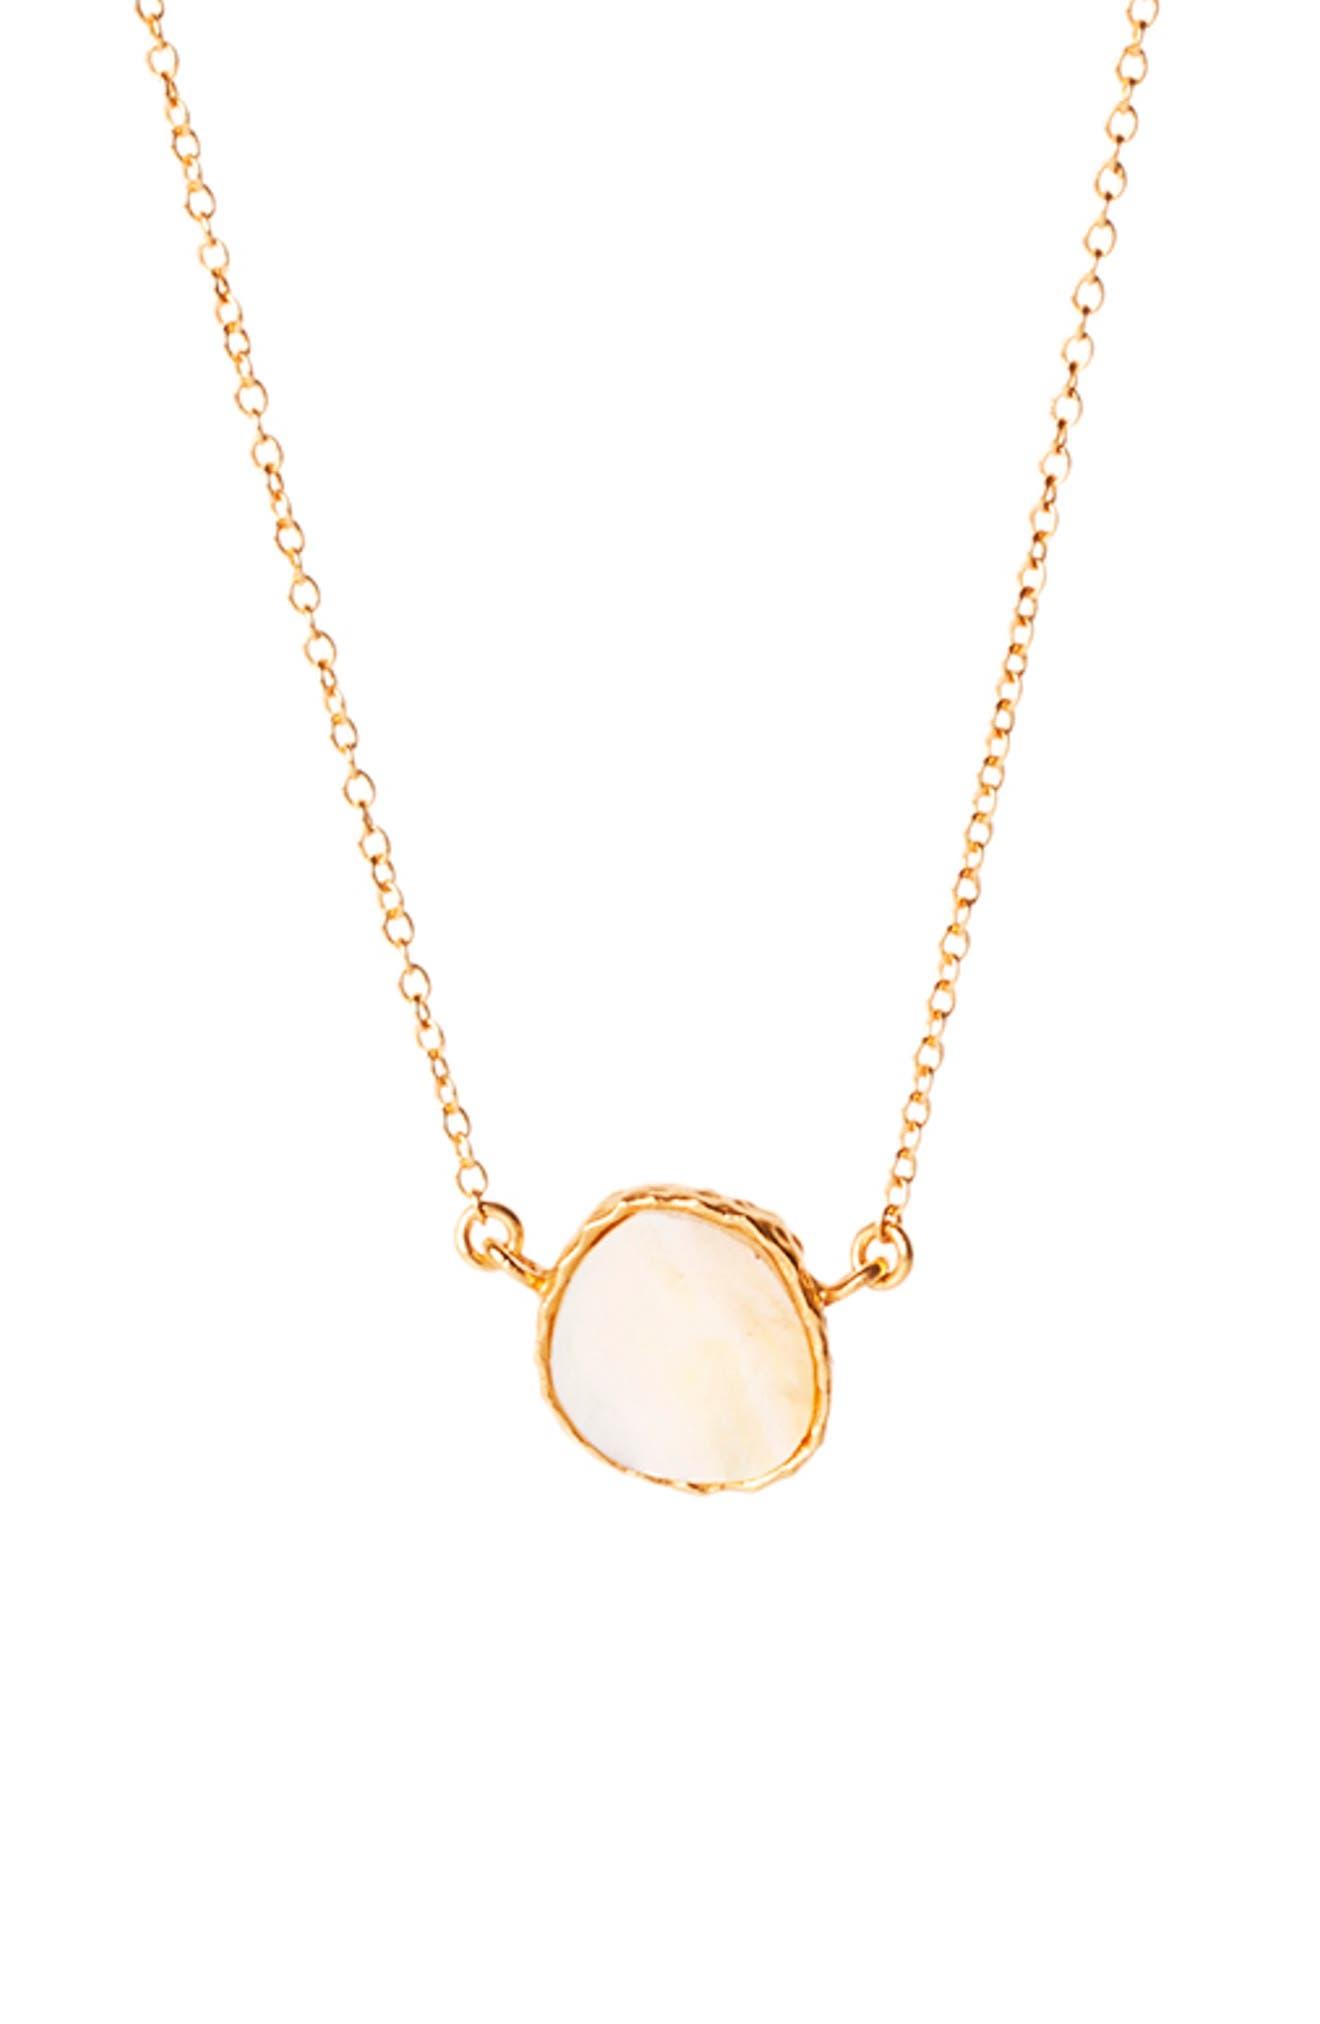 Delicate Pendant Necklace